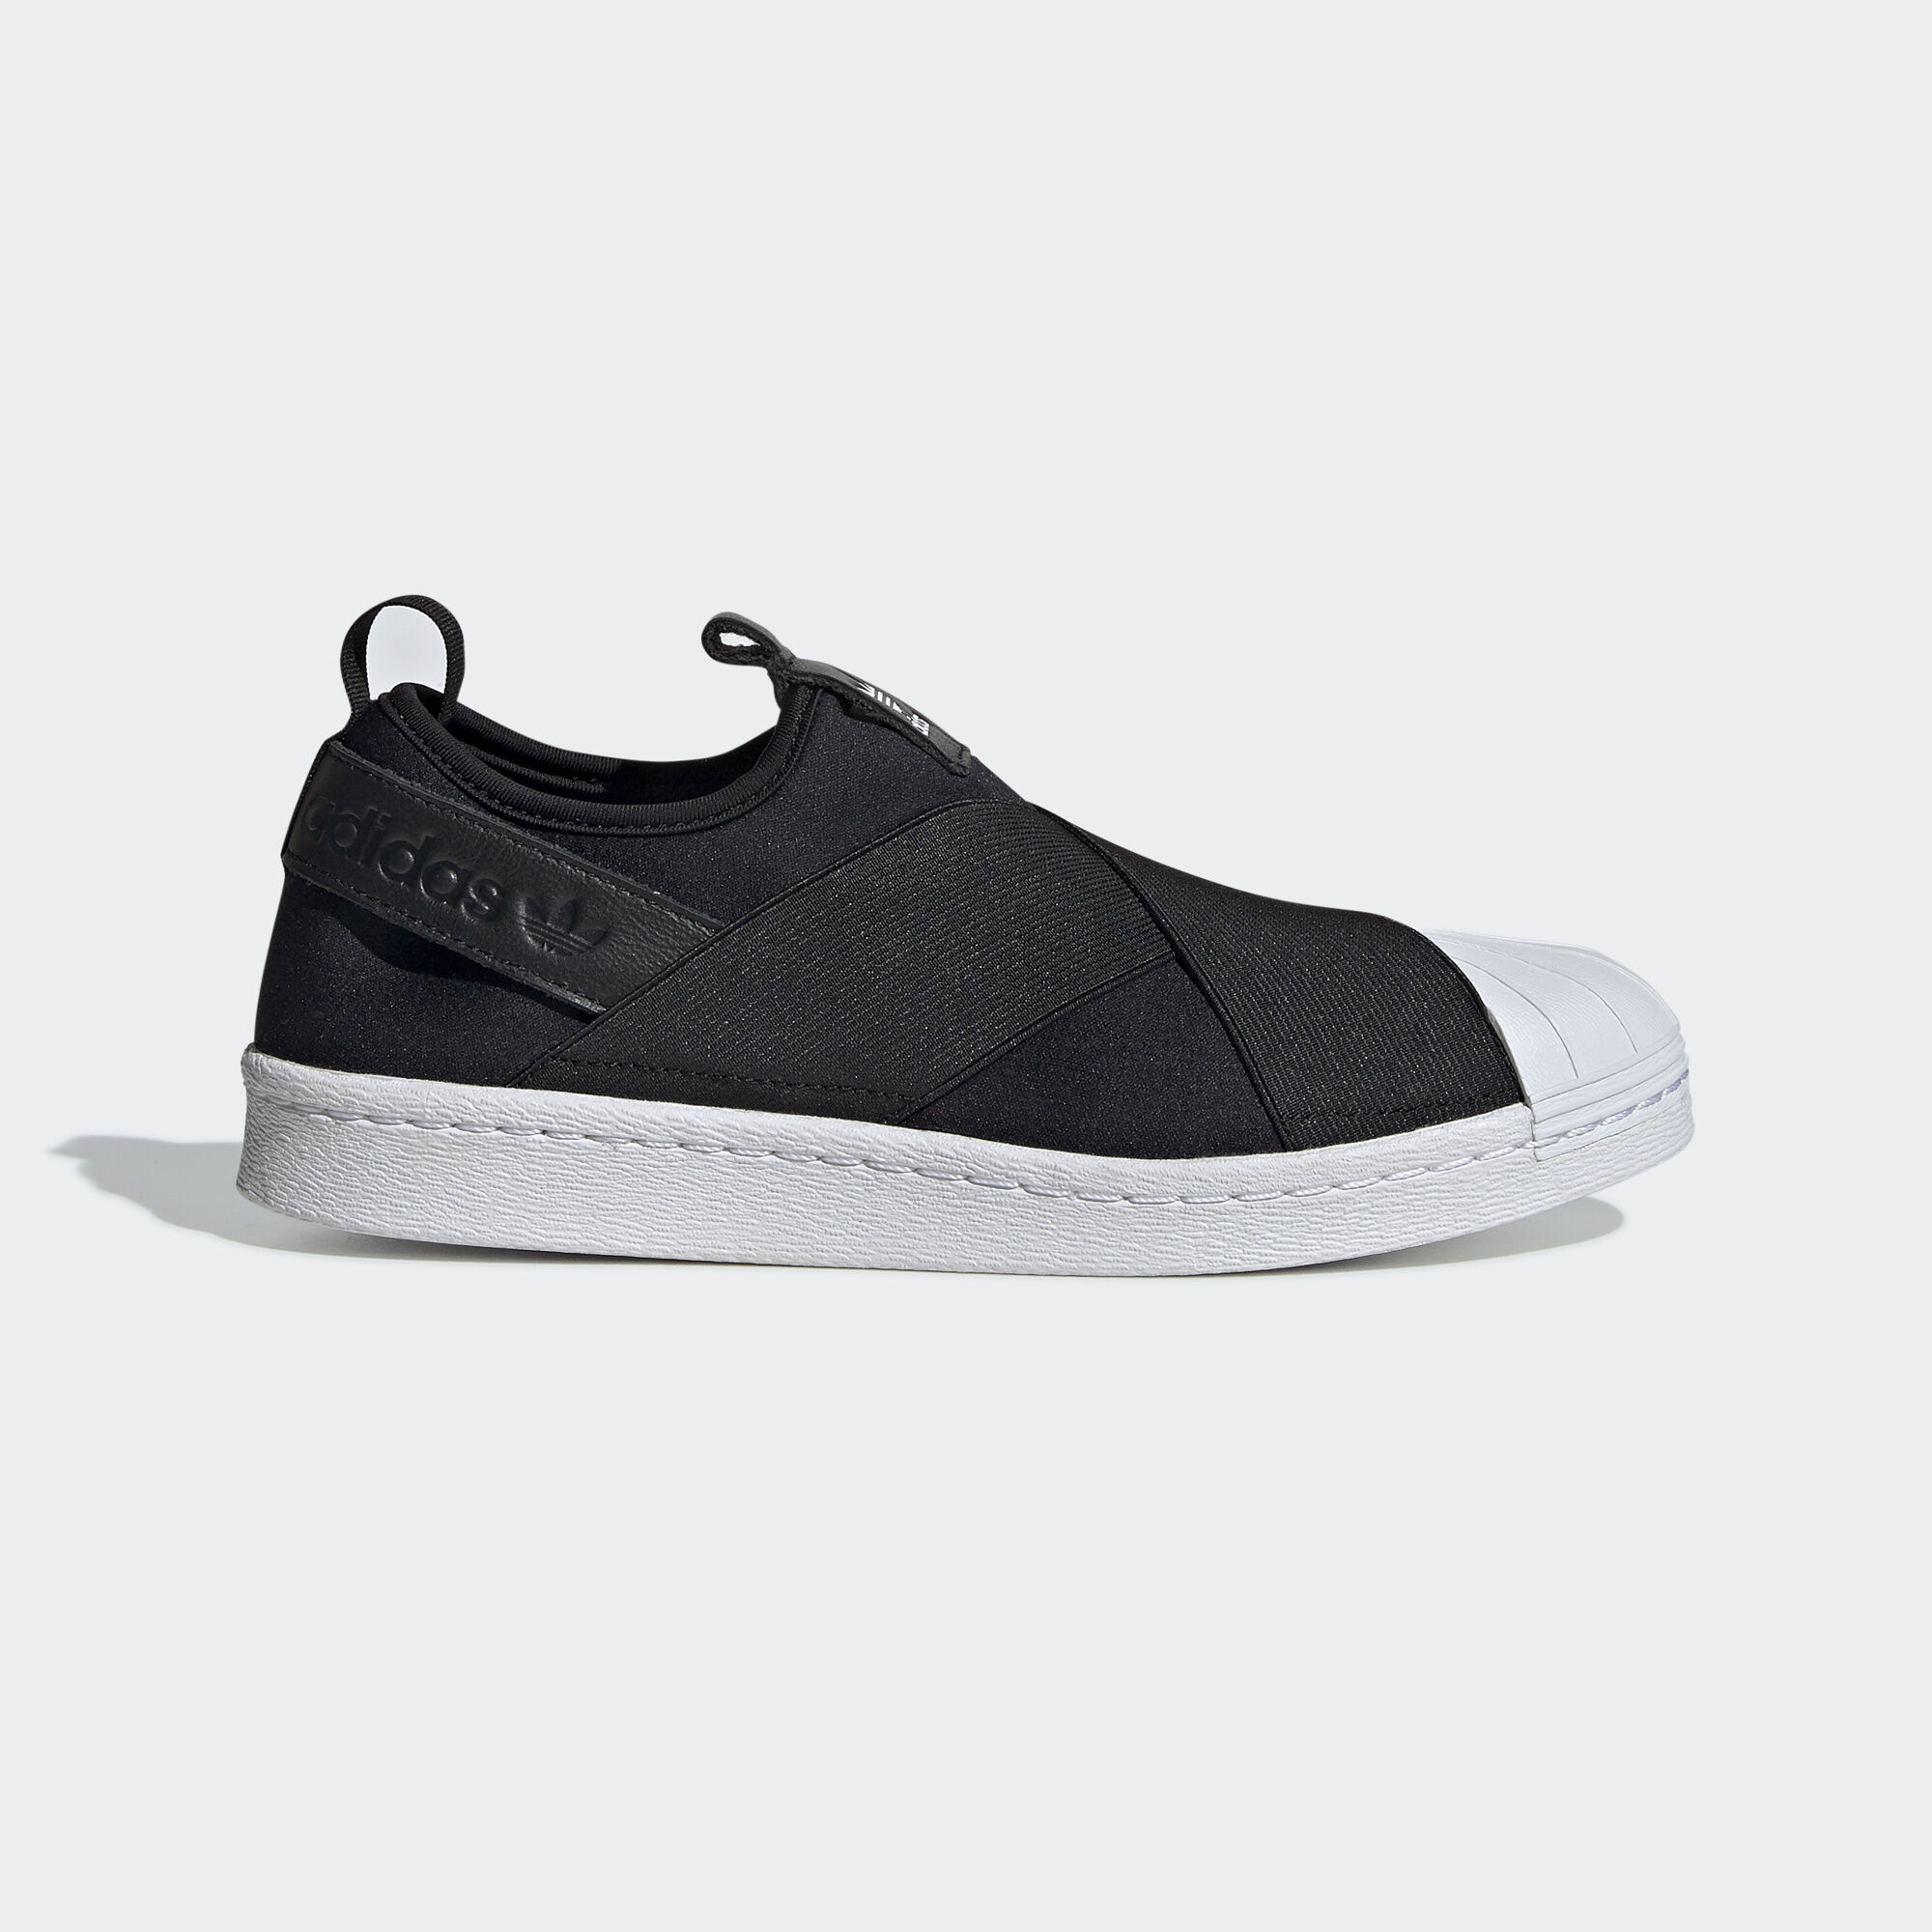 Adidas Scarpe 2016 Superstar Nere